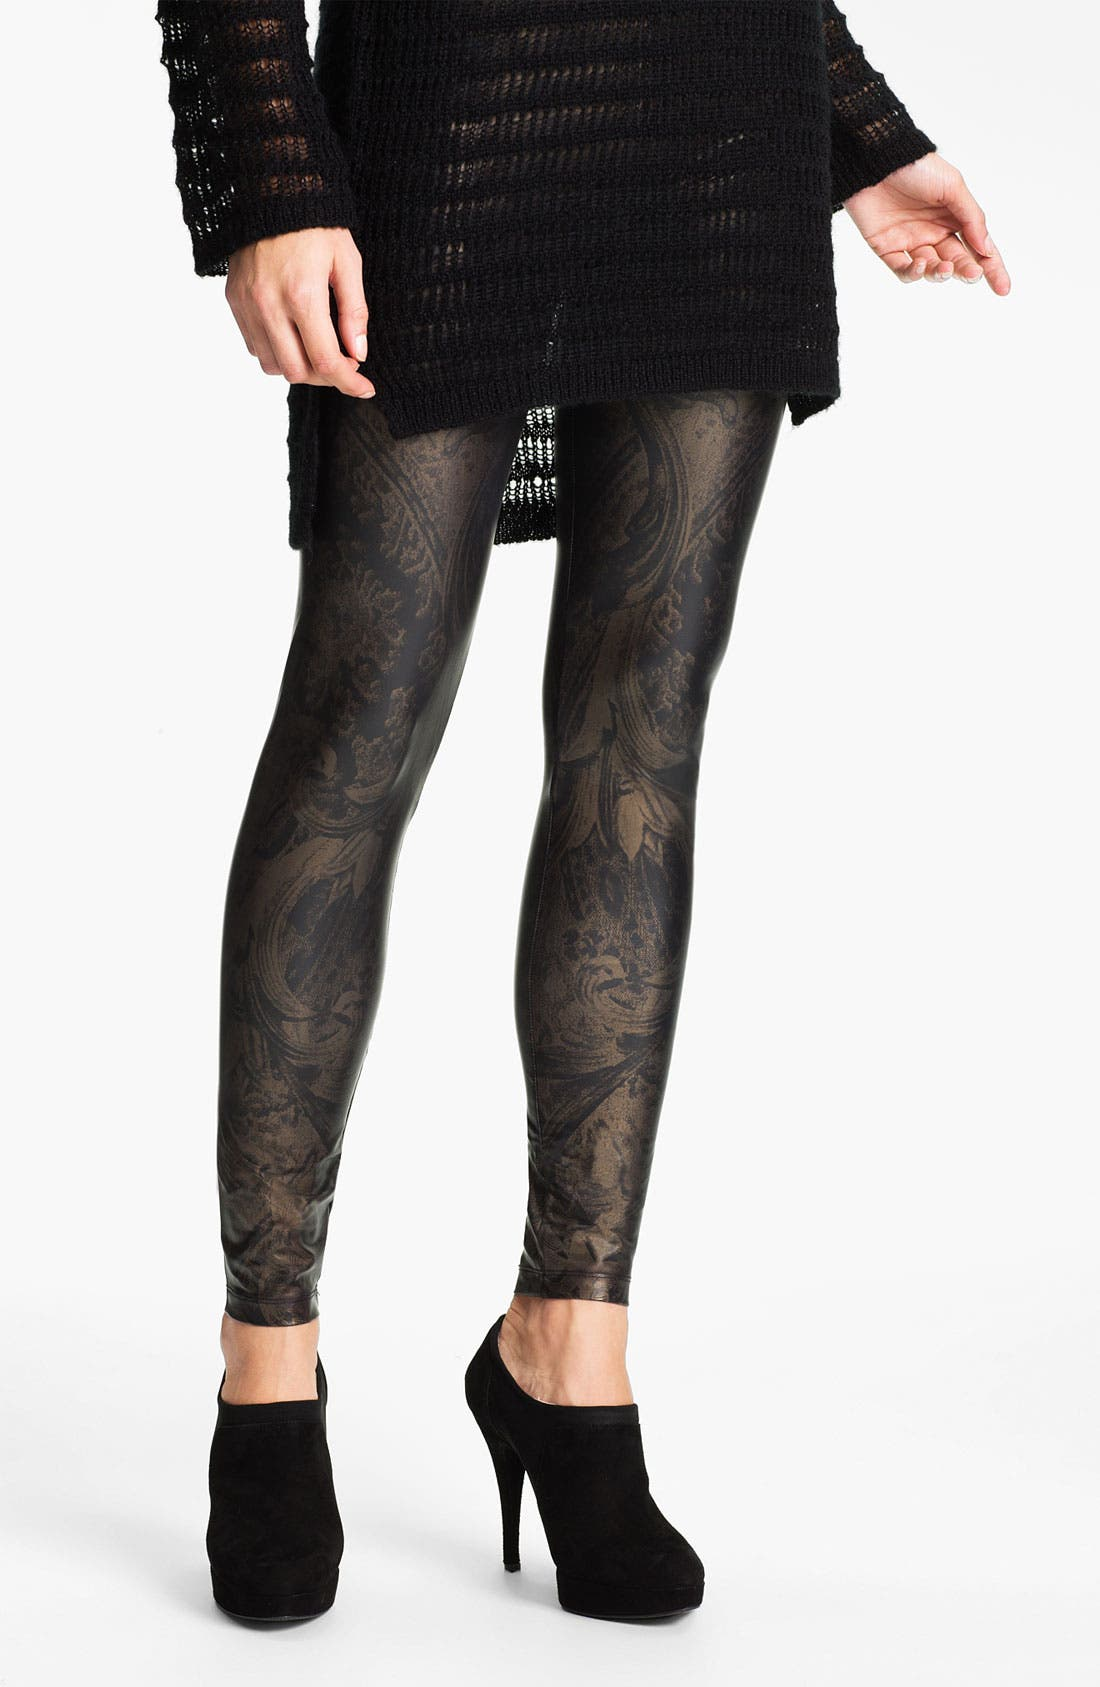 Alternate Image 1 Selected - Hot Sox 'Lusso' Foil Print Leggings